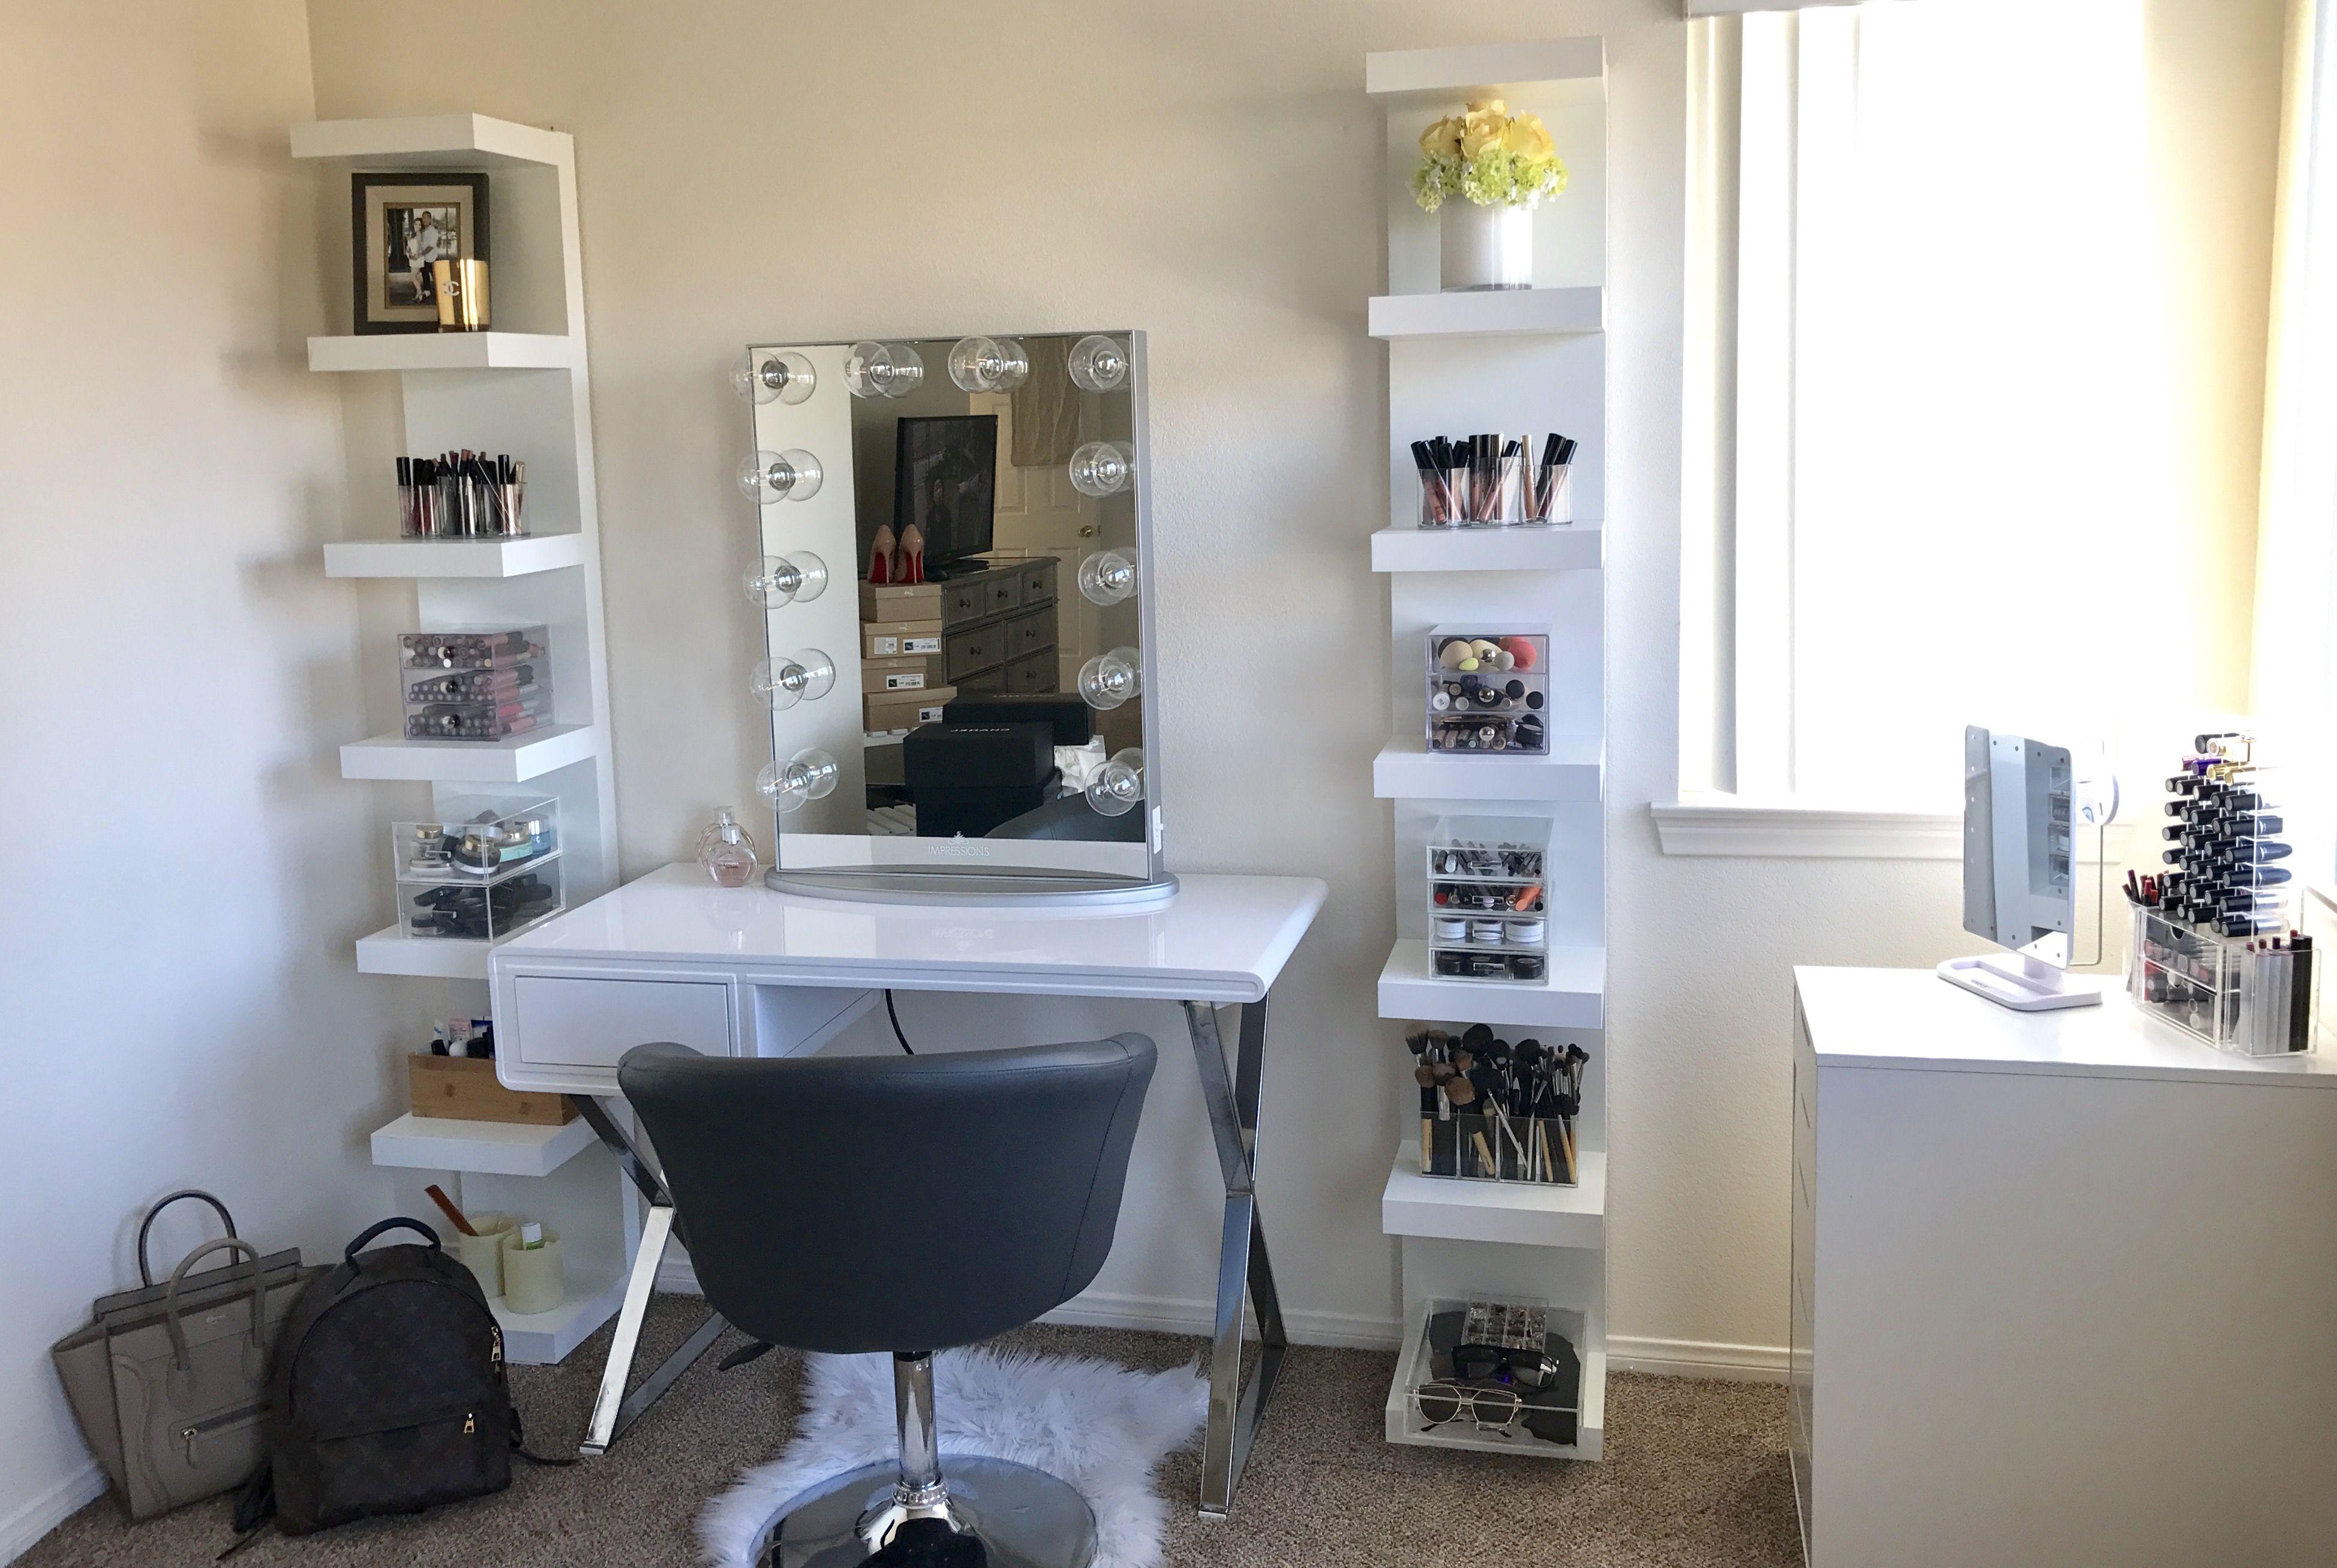 My Vanity Station Using Ikea Lack Shelf System And Impressions